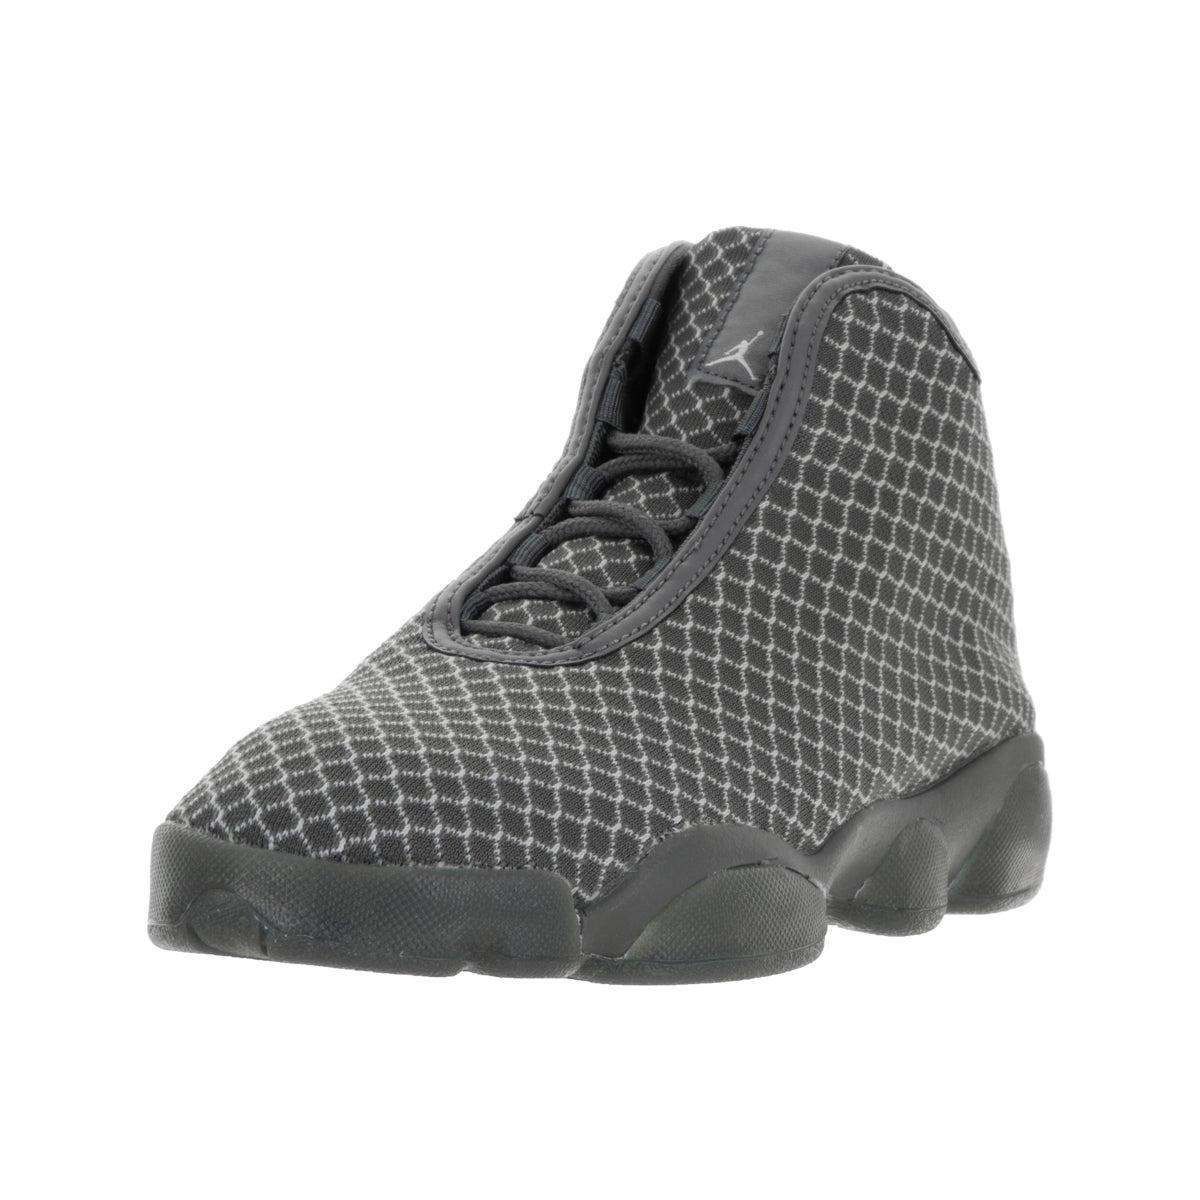 wholesale dealer 14283 1fa15 Shop Nike Jordan Kids Jordan Horizon BG Wolf Grey White Dark Grey  Basketball Shoes - Free Shipping Today - Overstock - 13394514